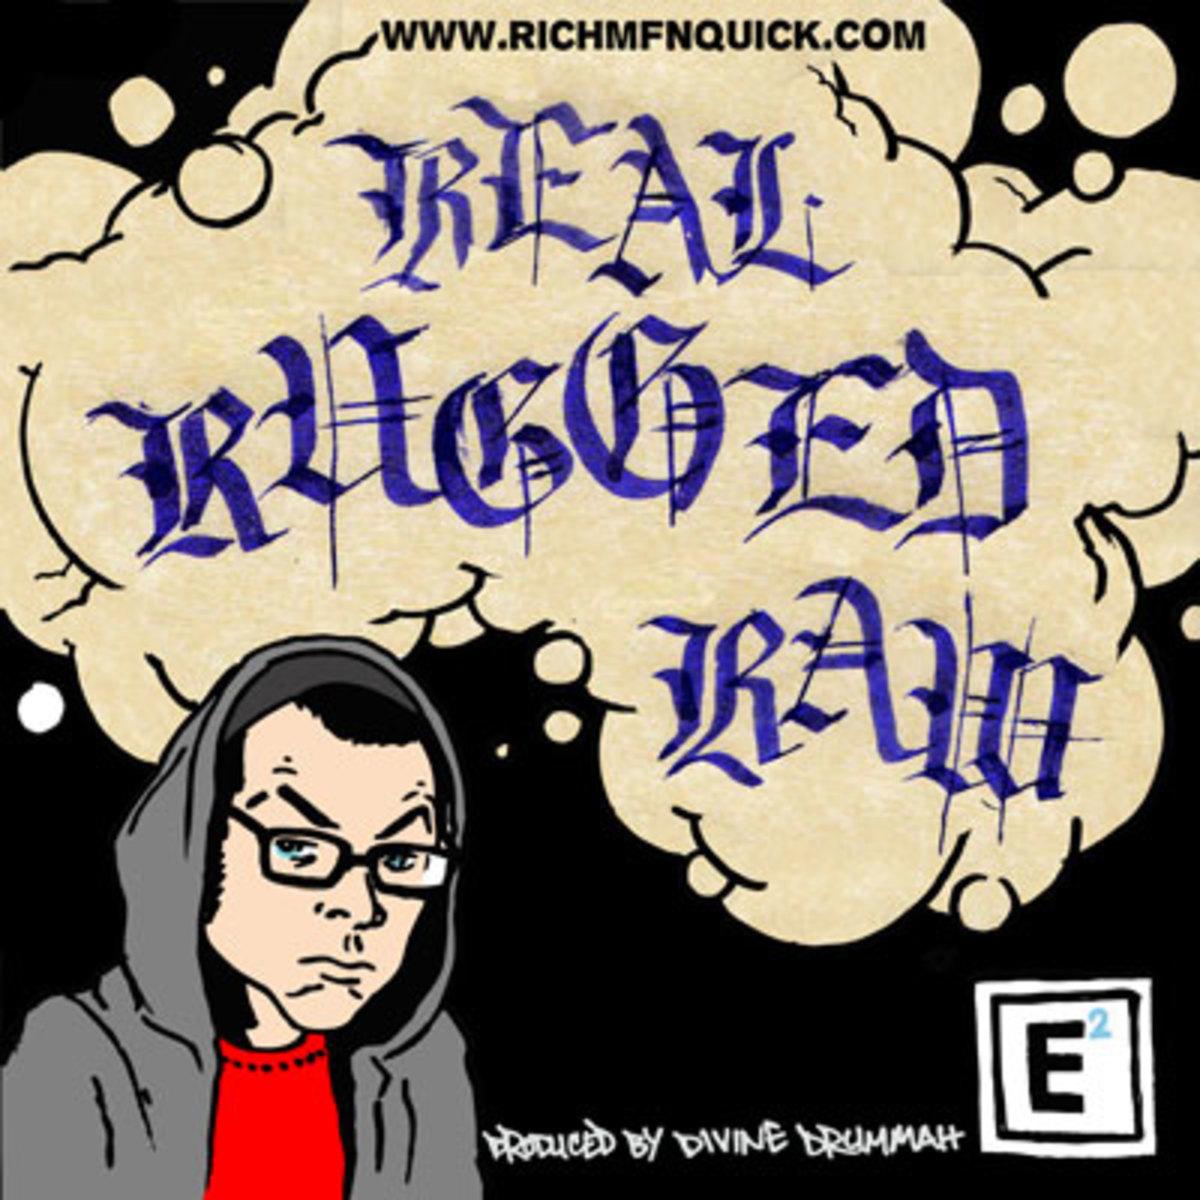 richquick-rrr.jpg